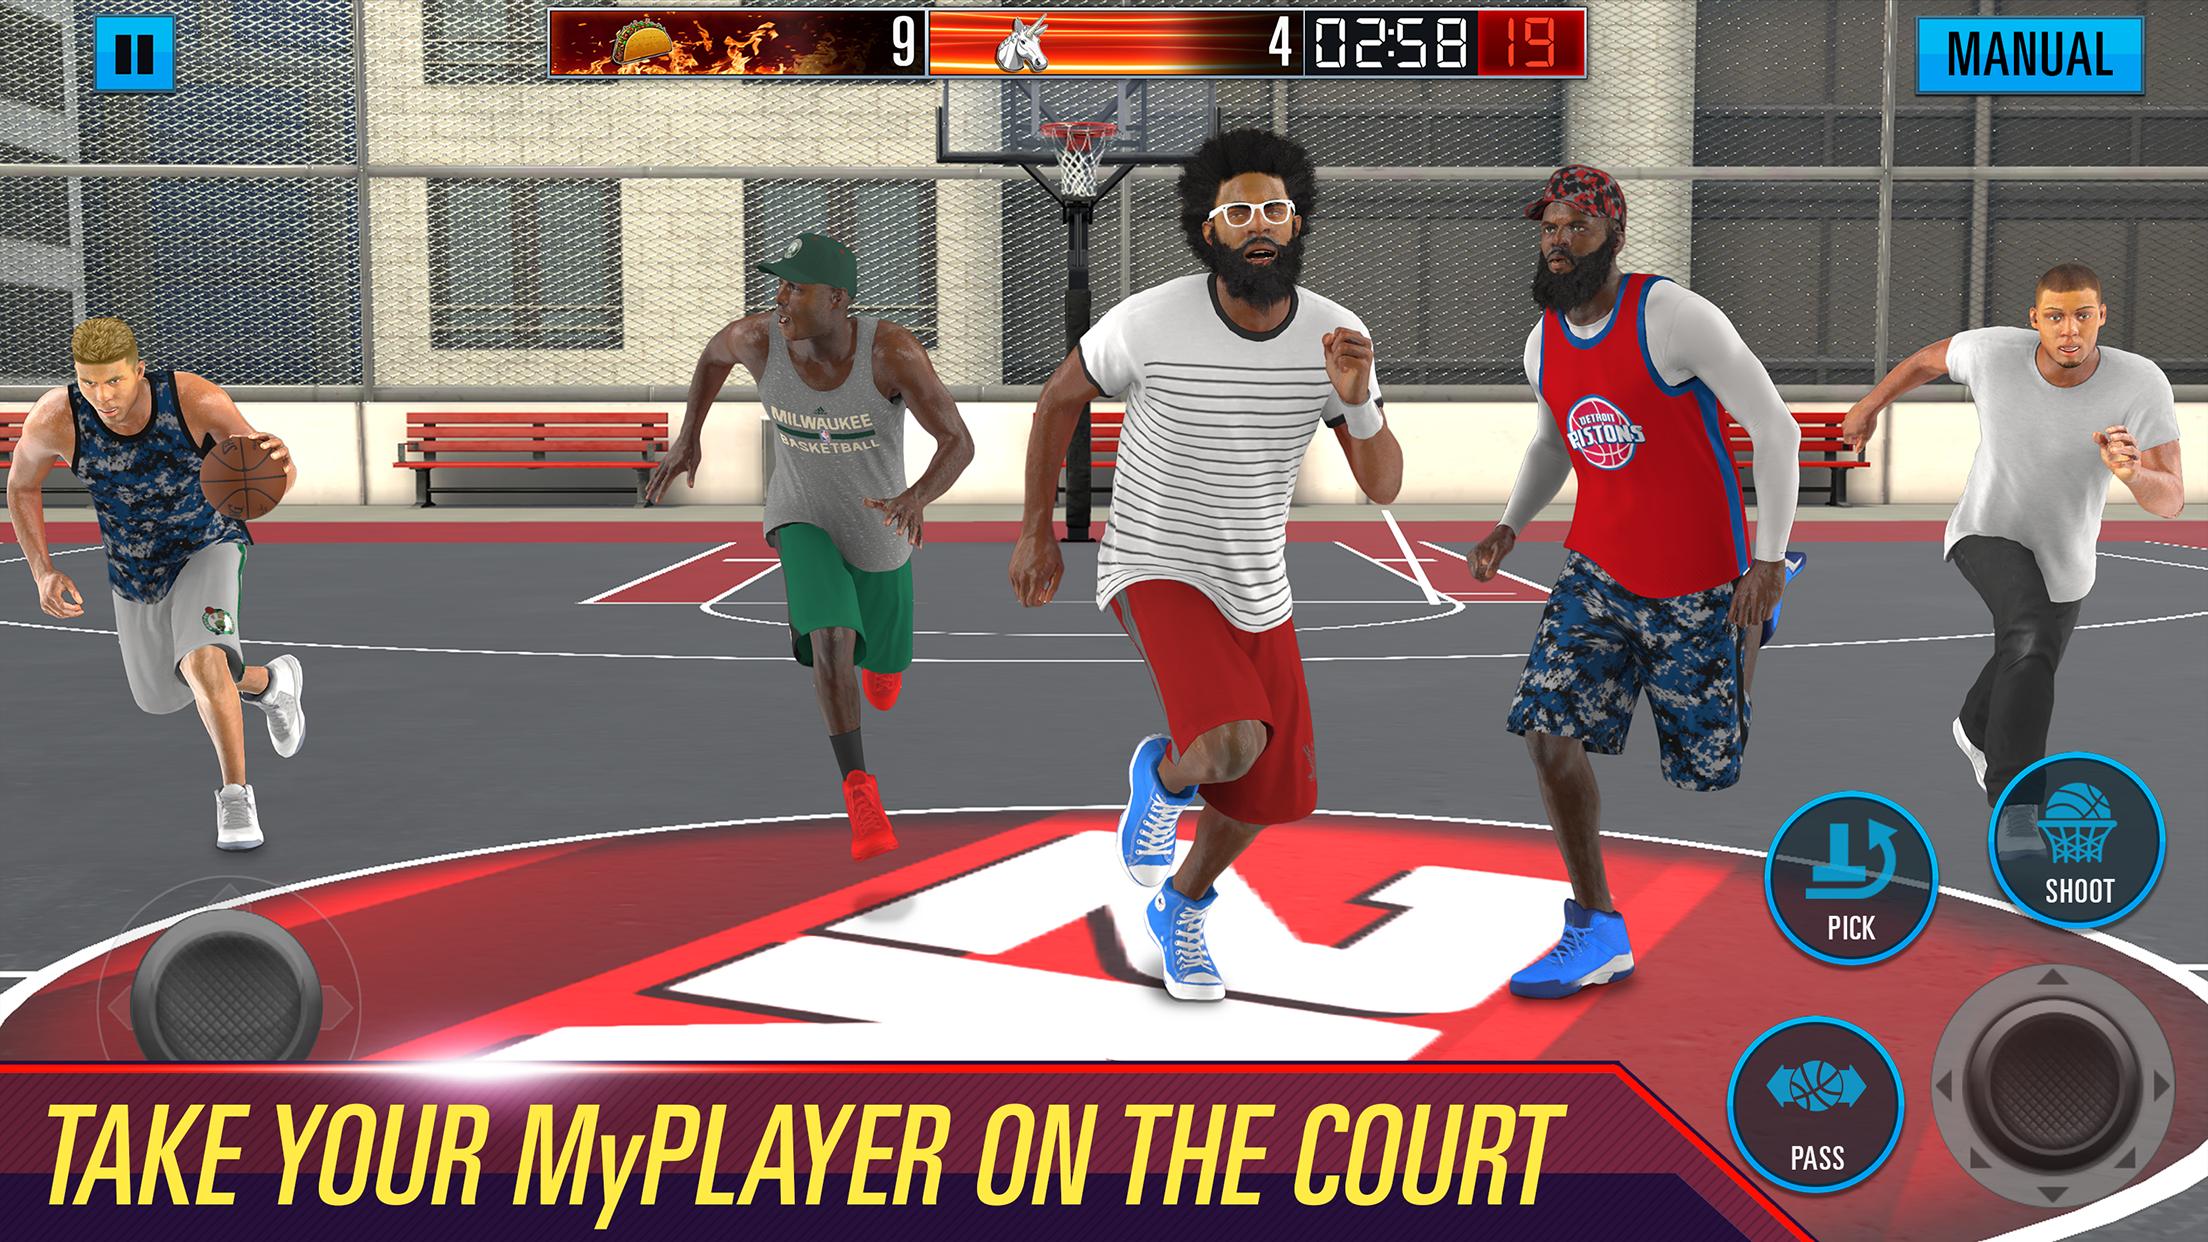 NBA2K-MOBILE_MYPLAYER_2208x1242_EN